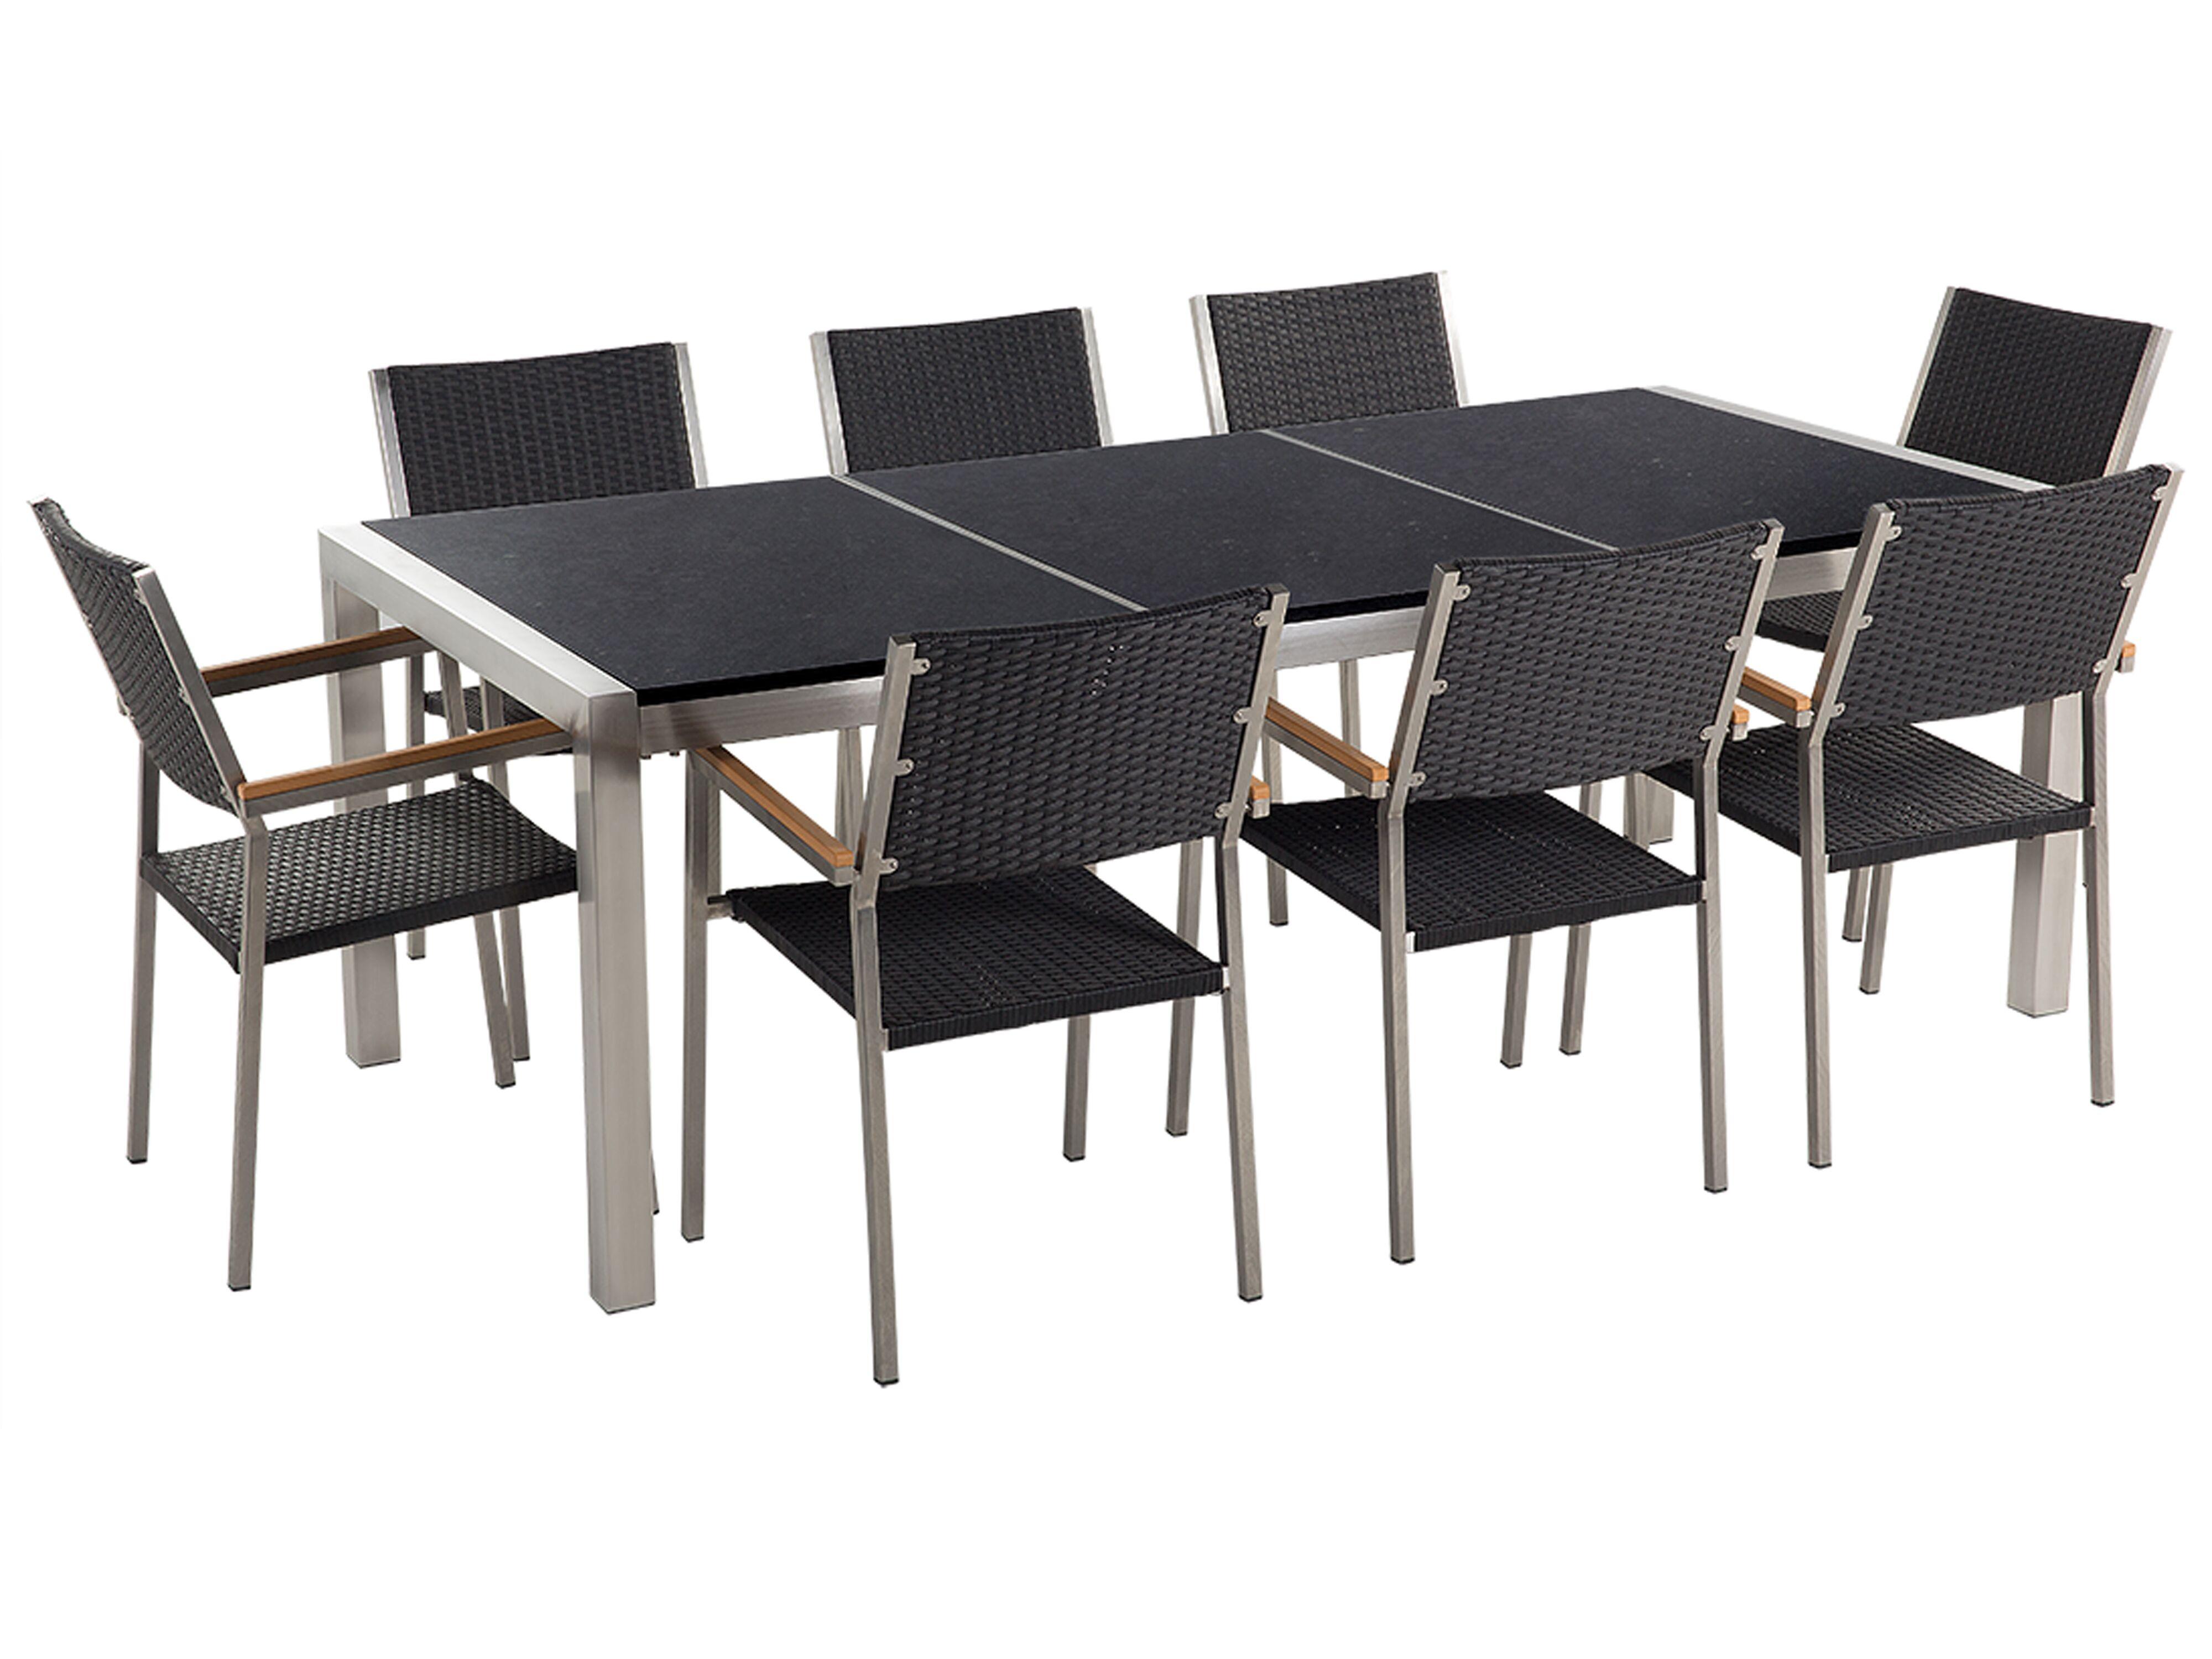 9 Seater Garden Dining Set Black Granite Top and Black Rattan ...